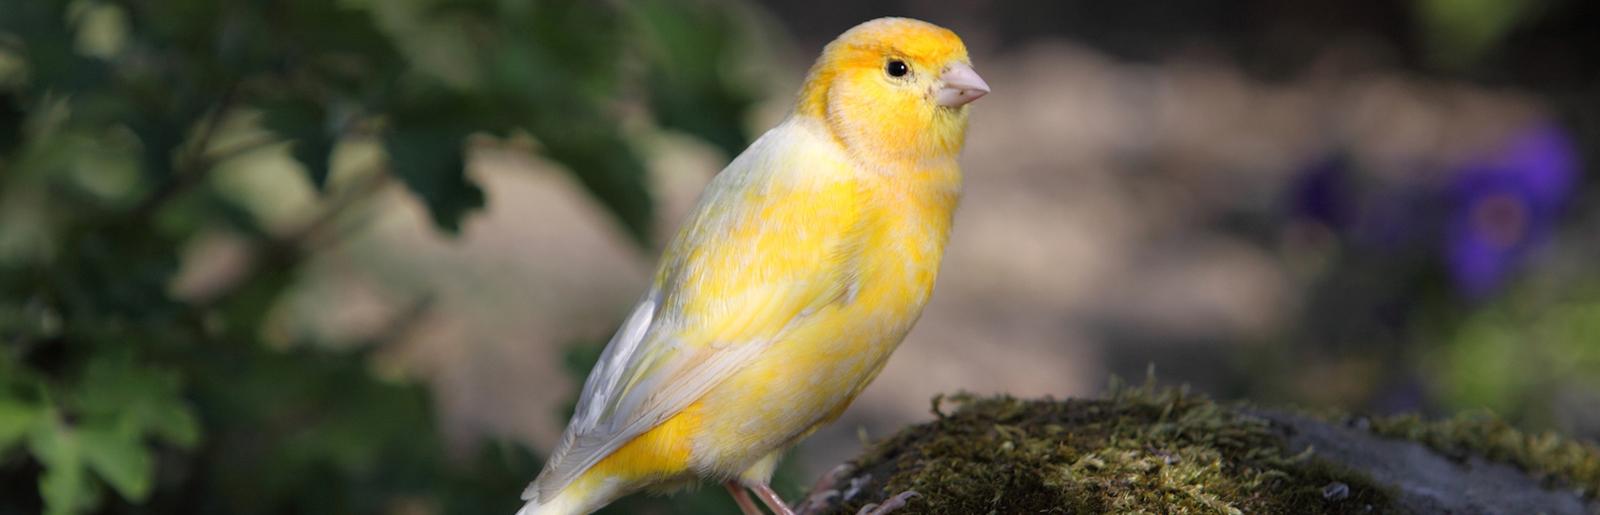 uccelli-canarini-slide-001